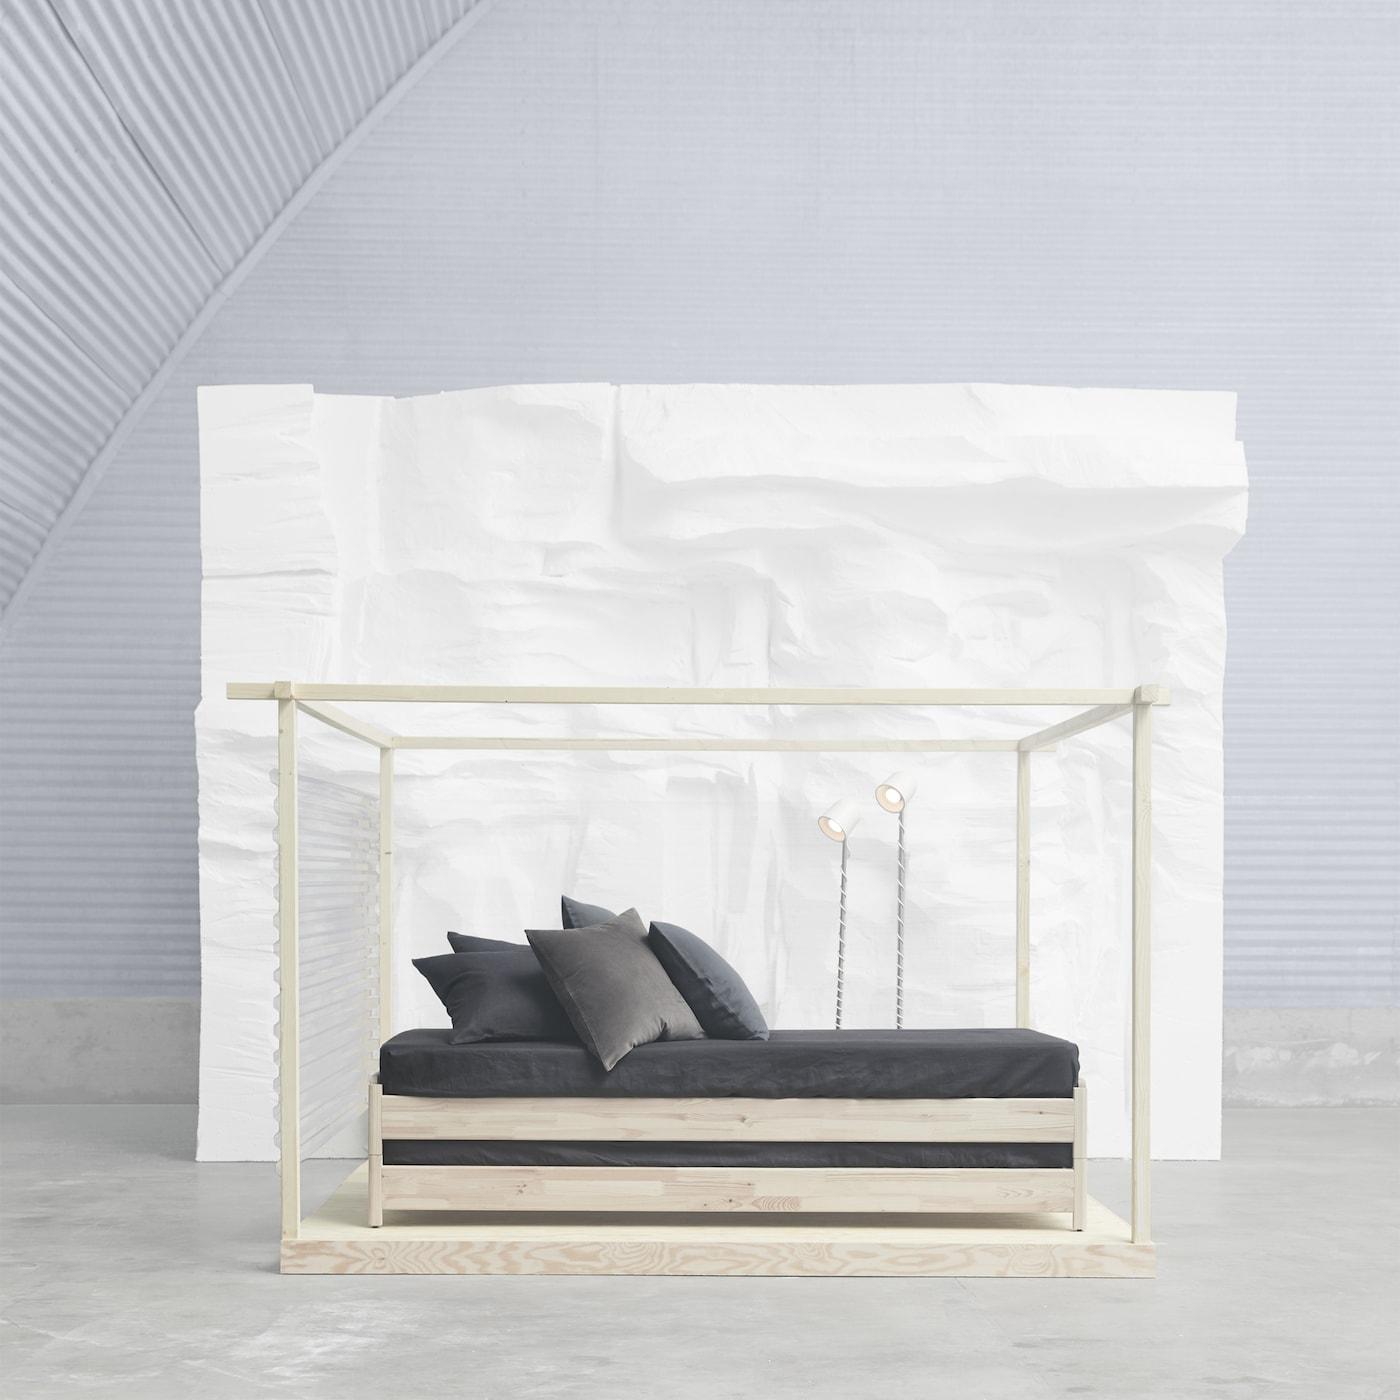 ut ker bett stapelbar ikea. Black Bedroom Furniture Sets. Home Design Ideas